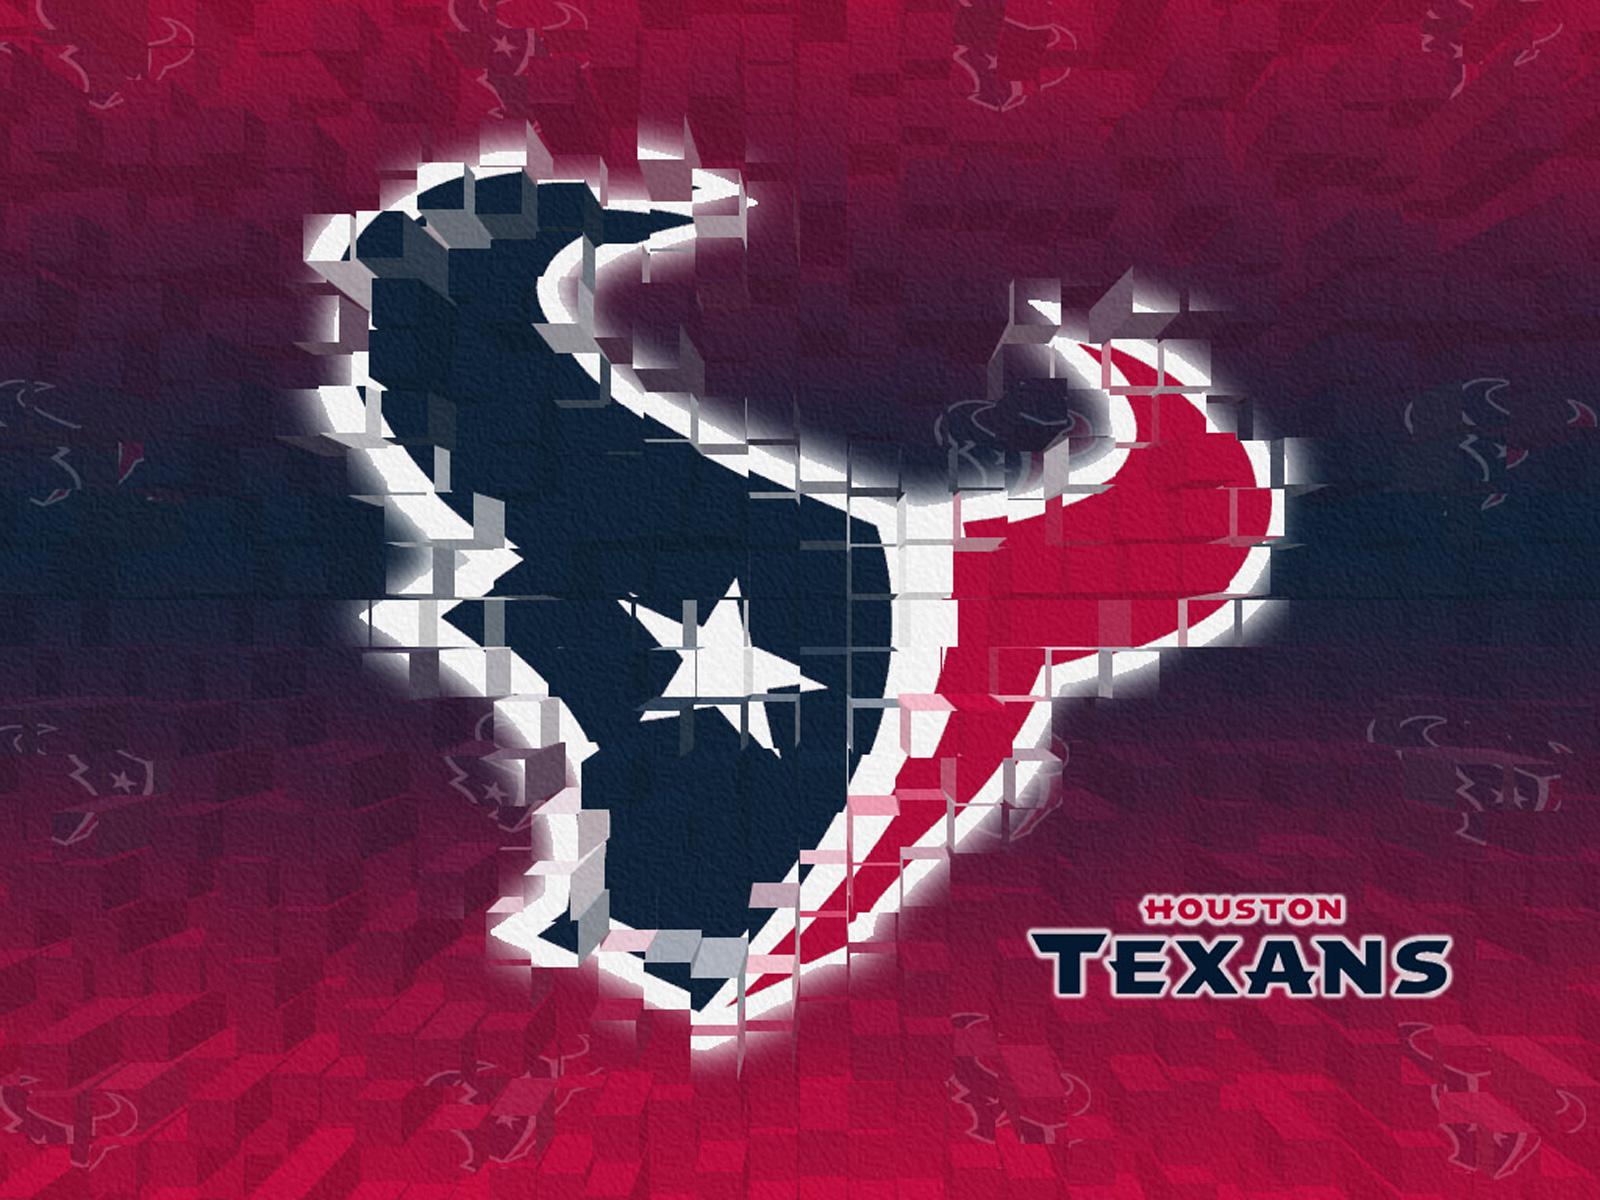 Houston Texans wallpaper Houston Texans logo nfl wallpaper 1600x1200